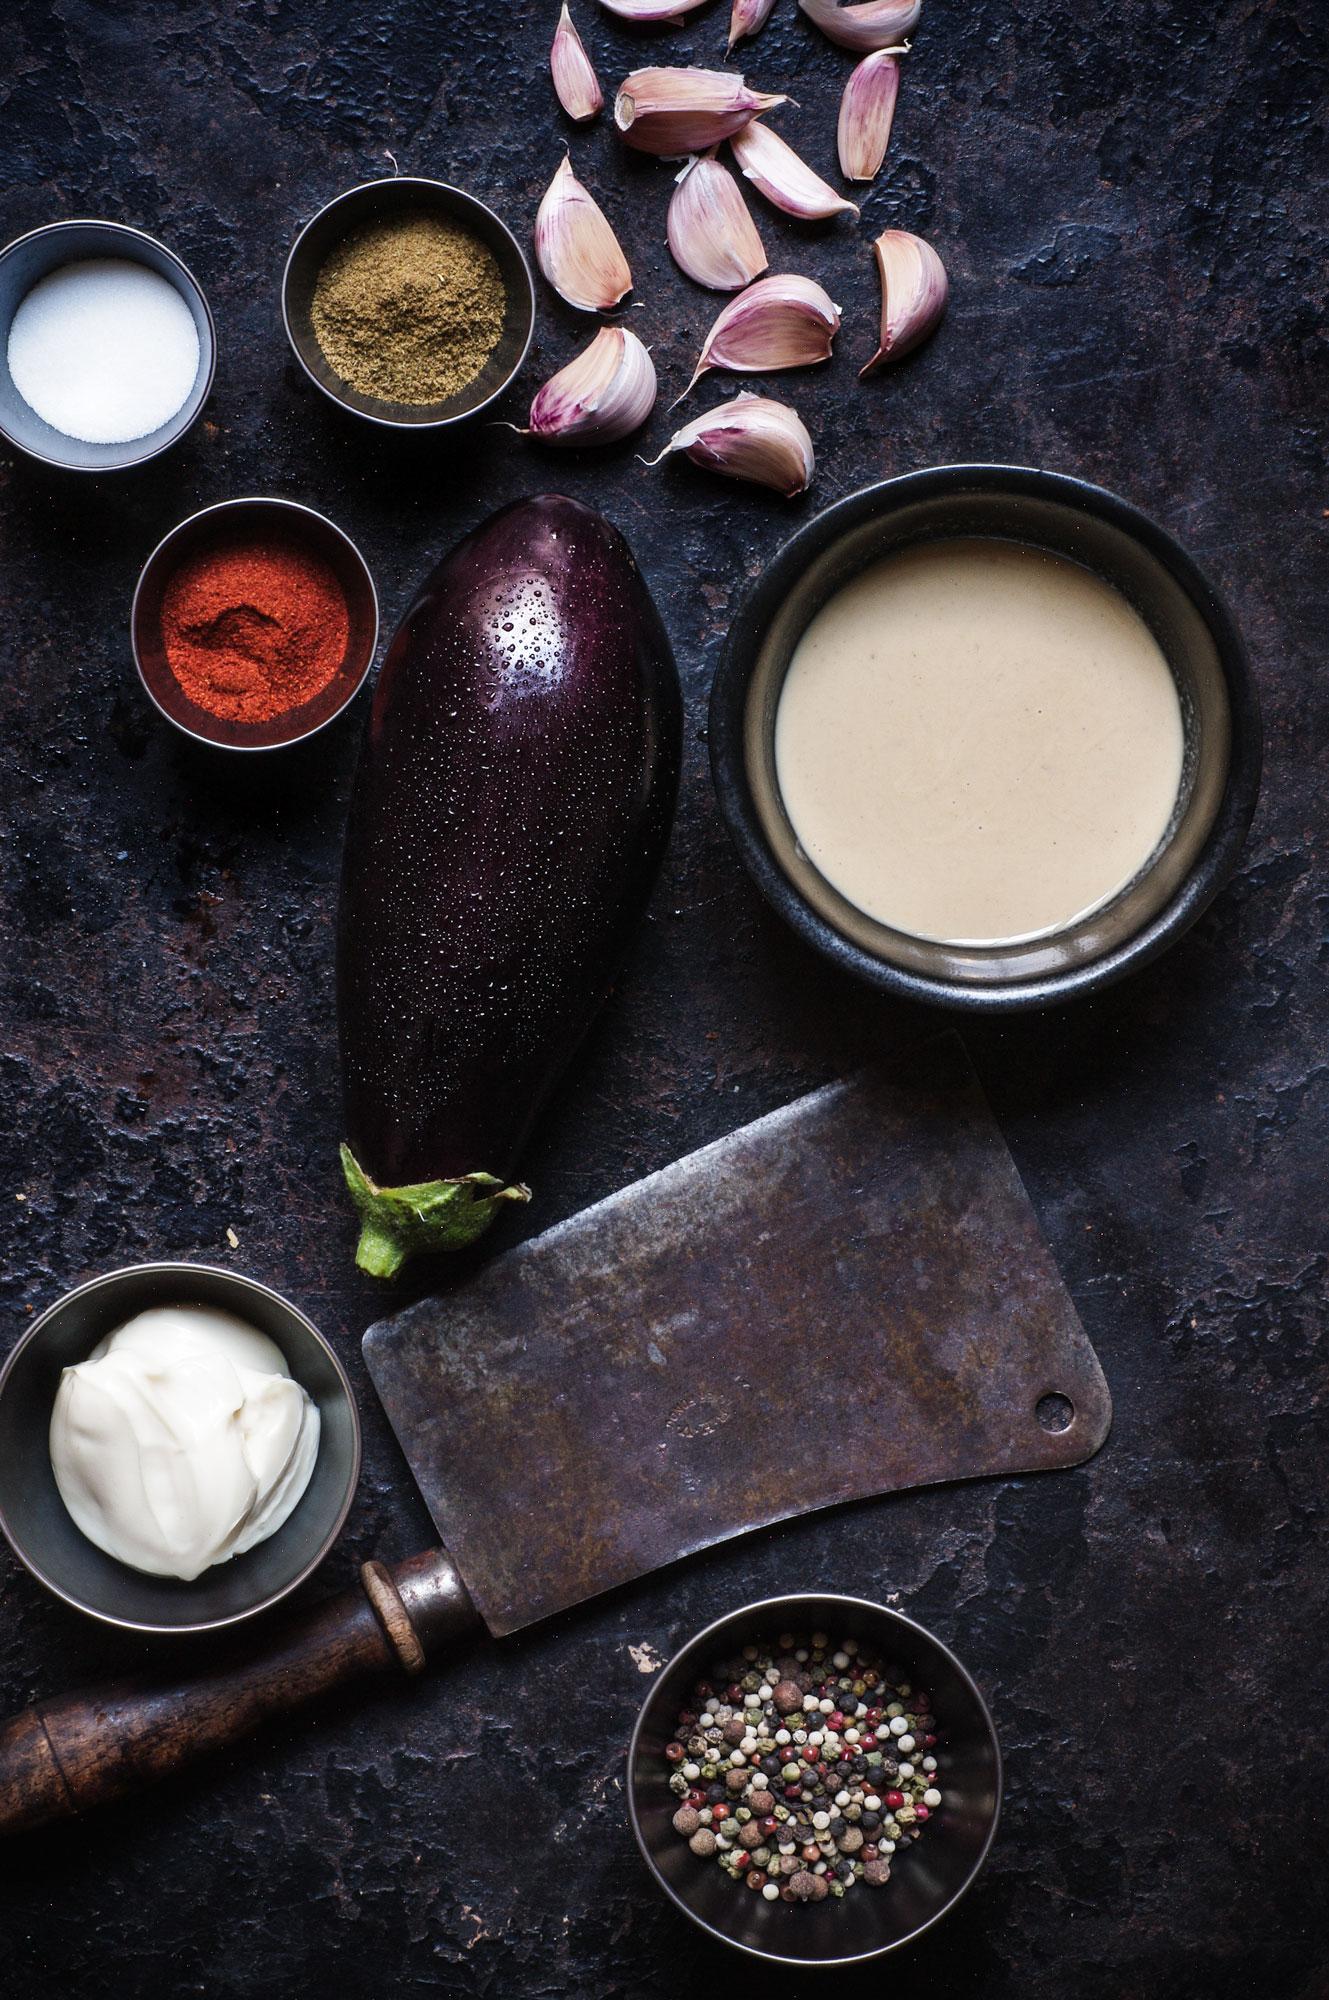 bell pepper, red pepper, jewish food, kosher, tchatchouka, jam , tomato, vegan, healthy, eggplant, caviar, aubergine, salade de chabath, kemia, paprika